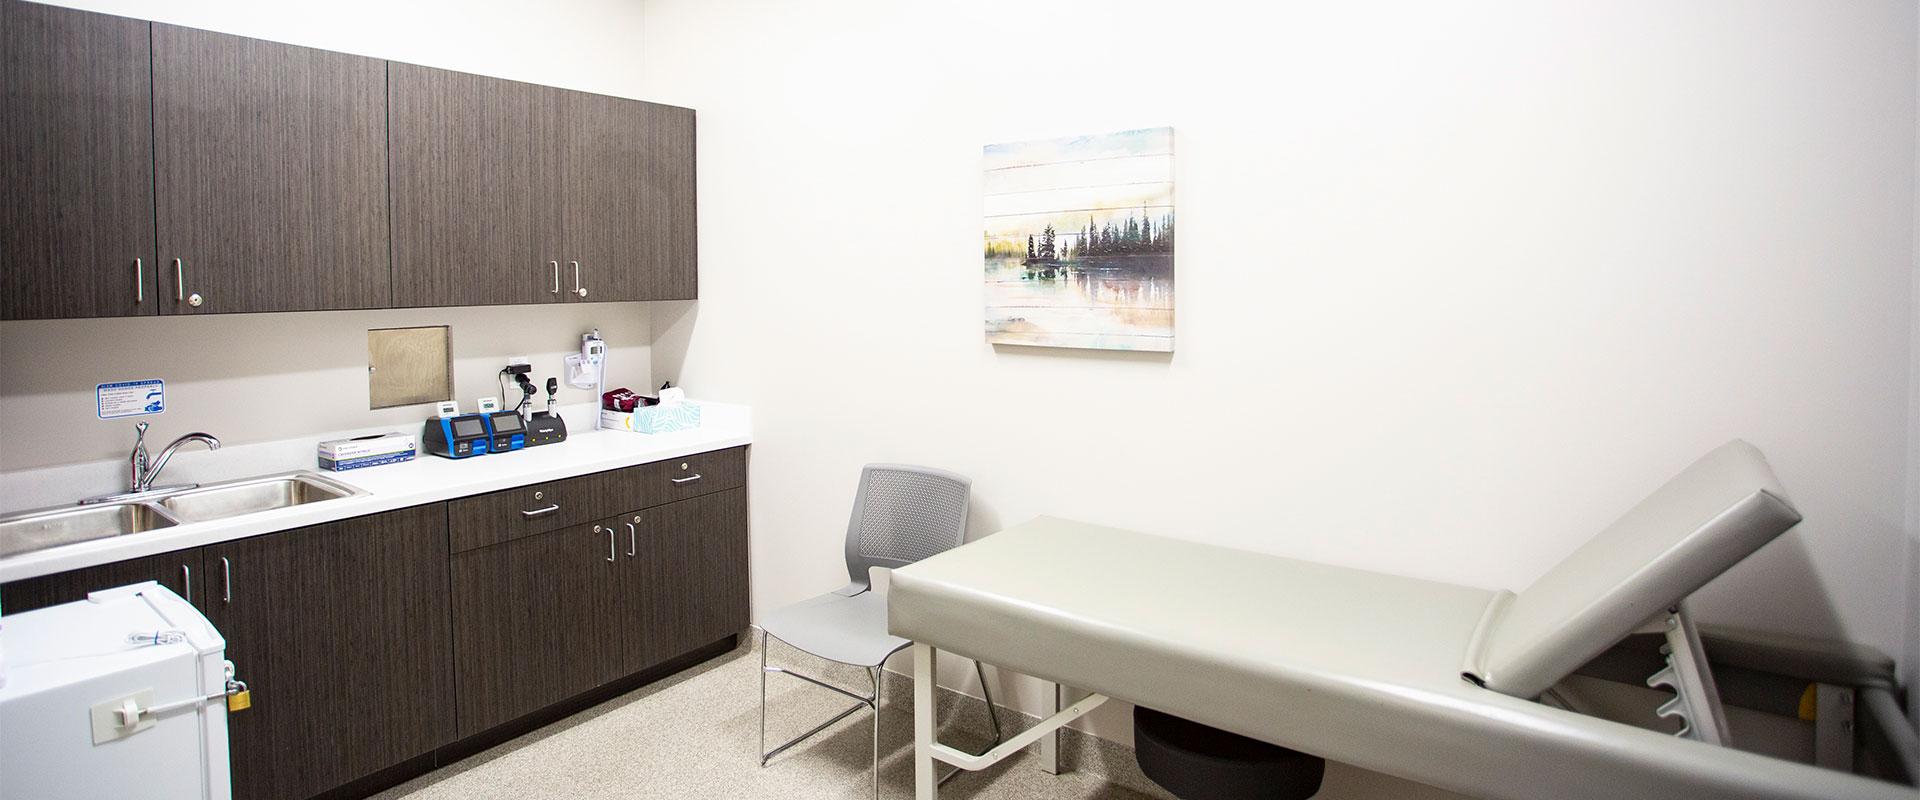 Free Onsite Employee Healthcare – An Innovative Idea! Exam Room